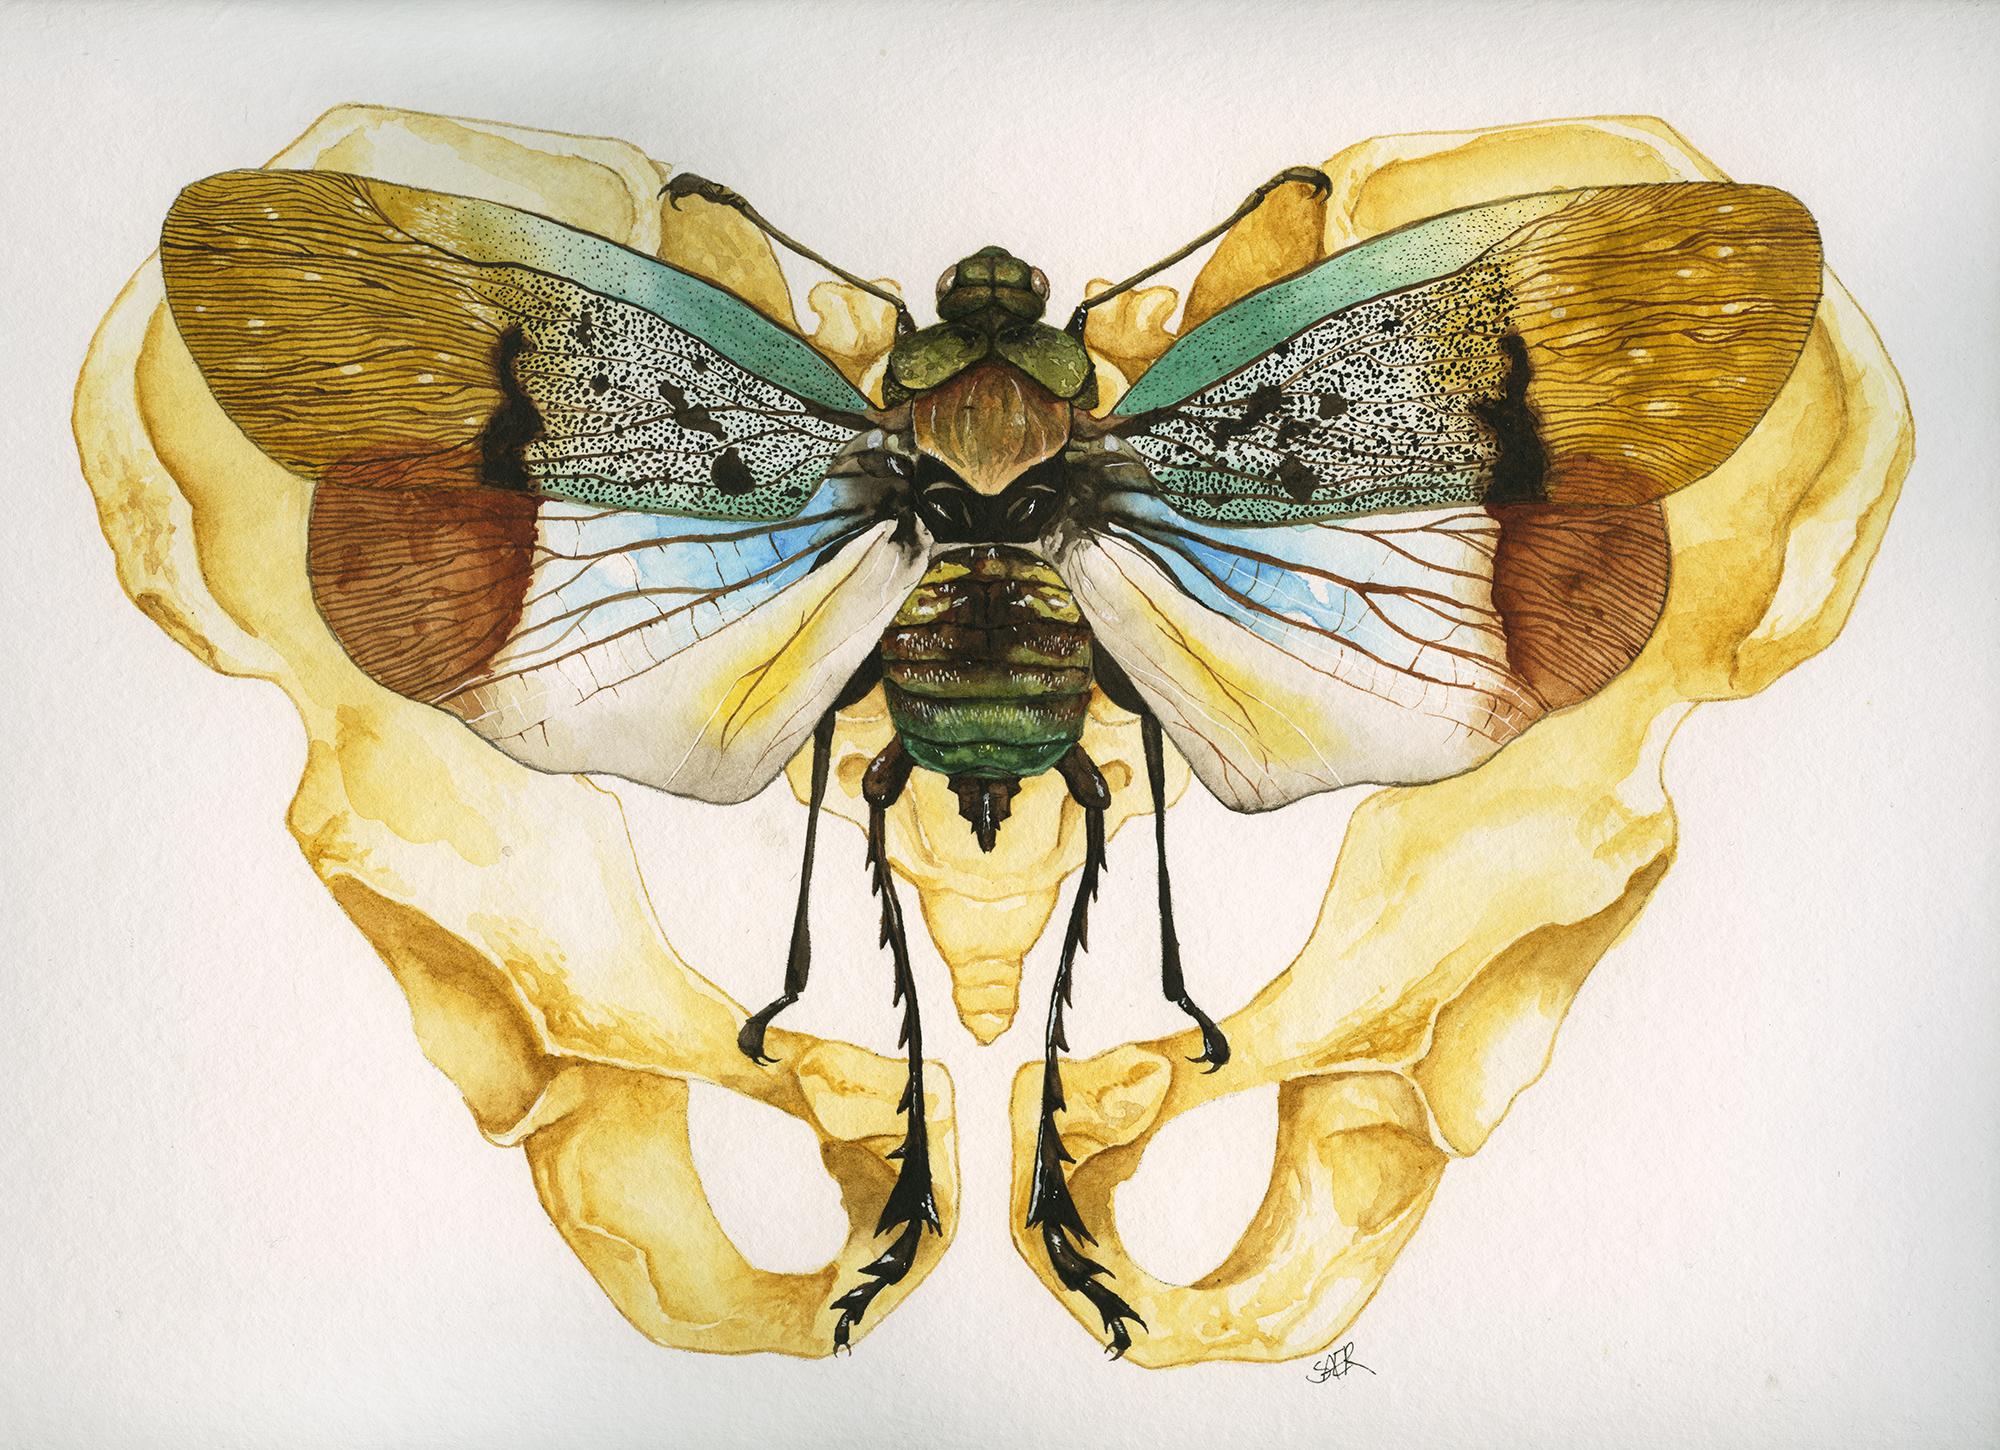 Cicada and Pelvis